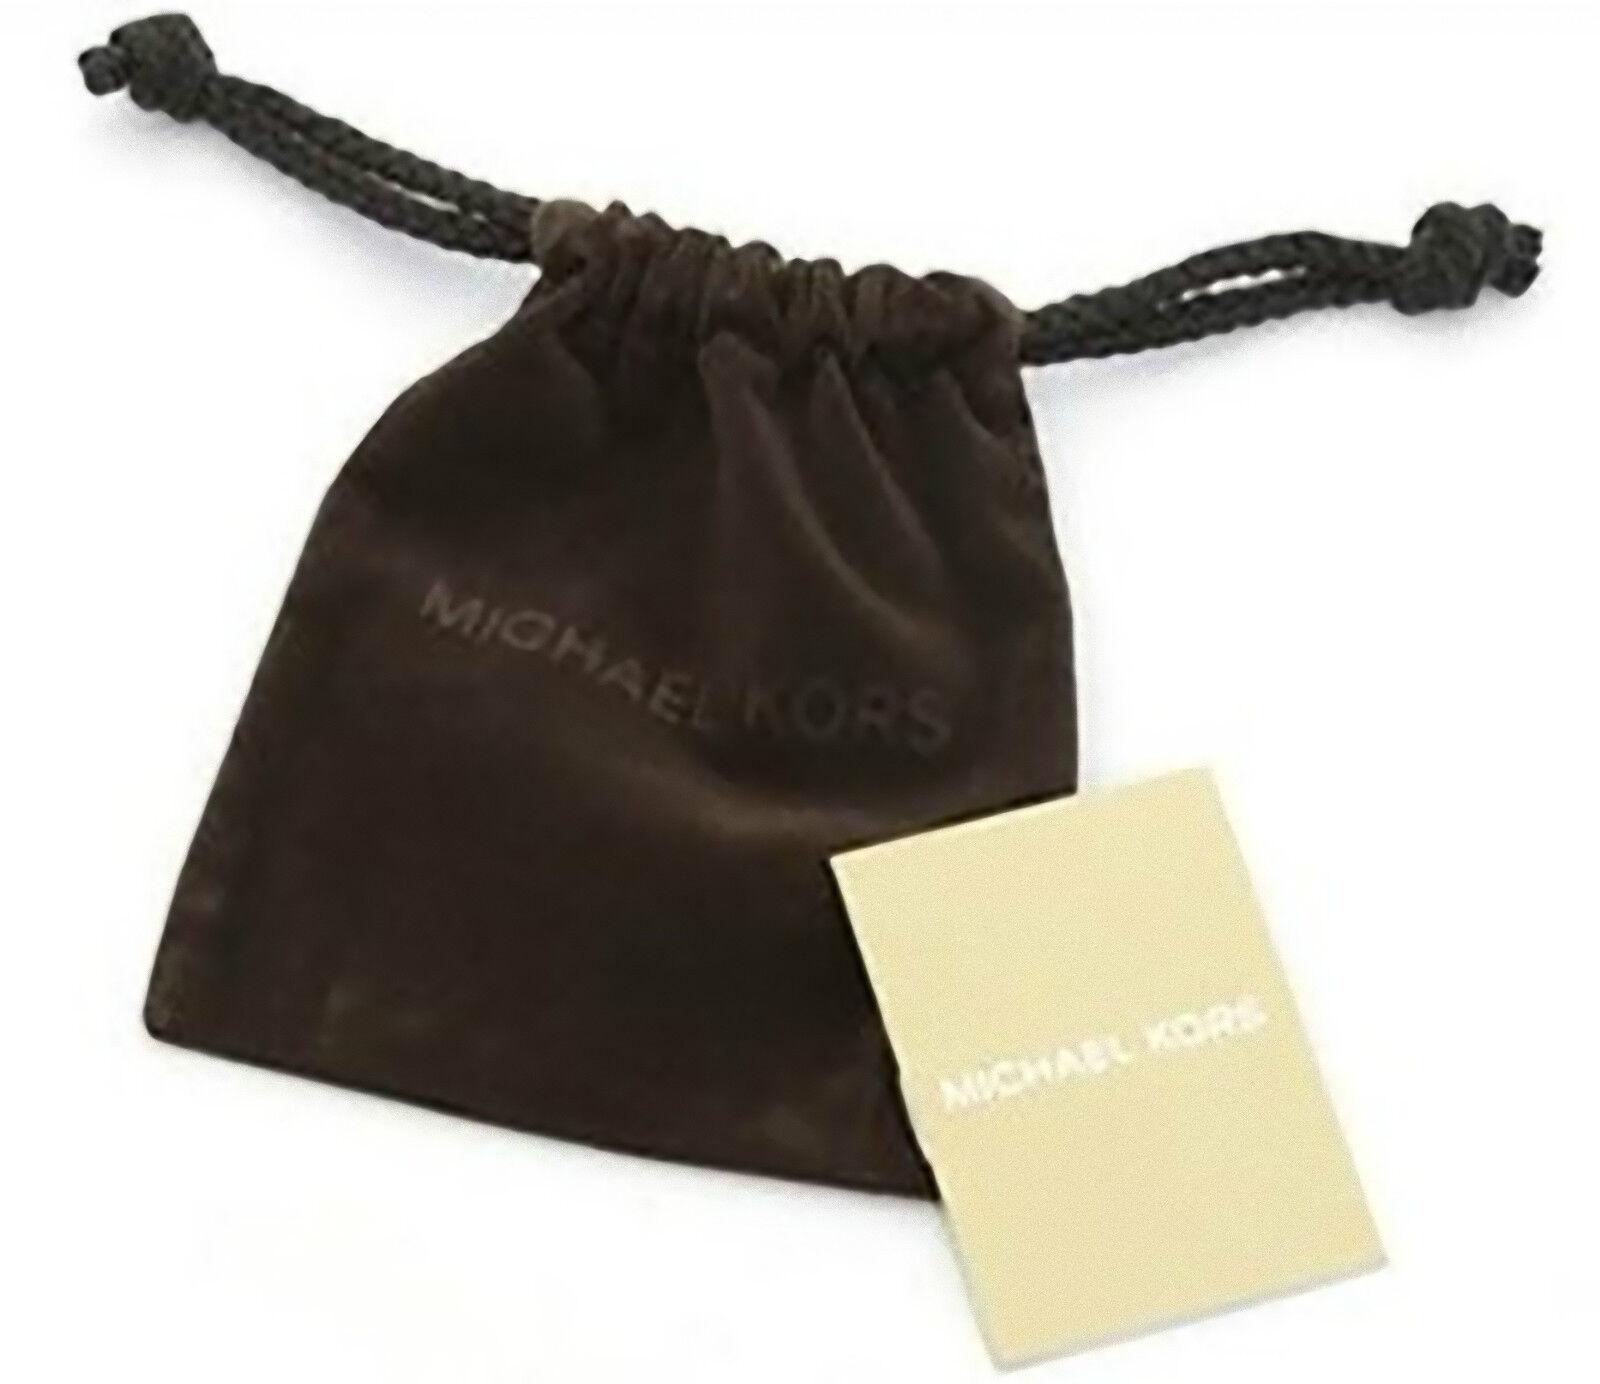 michael kors mkj3373710 armreif bracelet in farbe gold. Black Bedroom Furniture Sets. Home Design Ideas